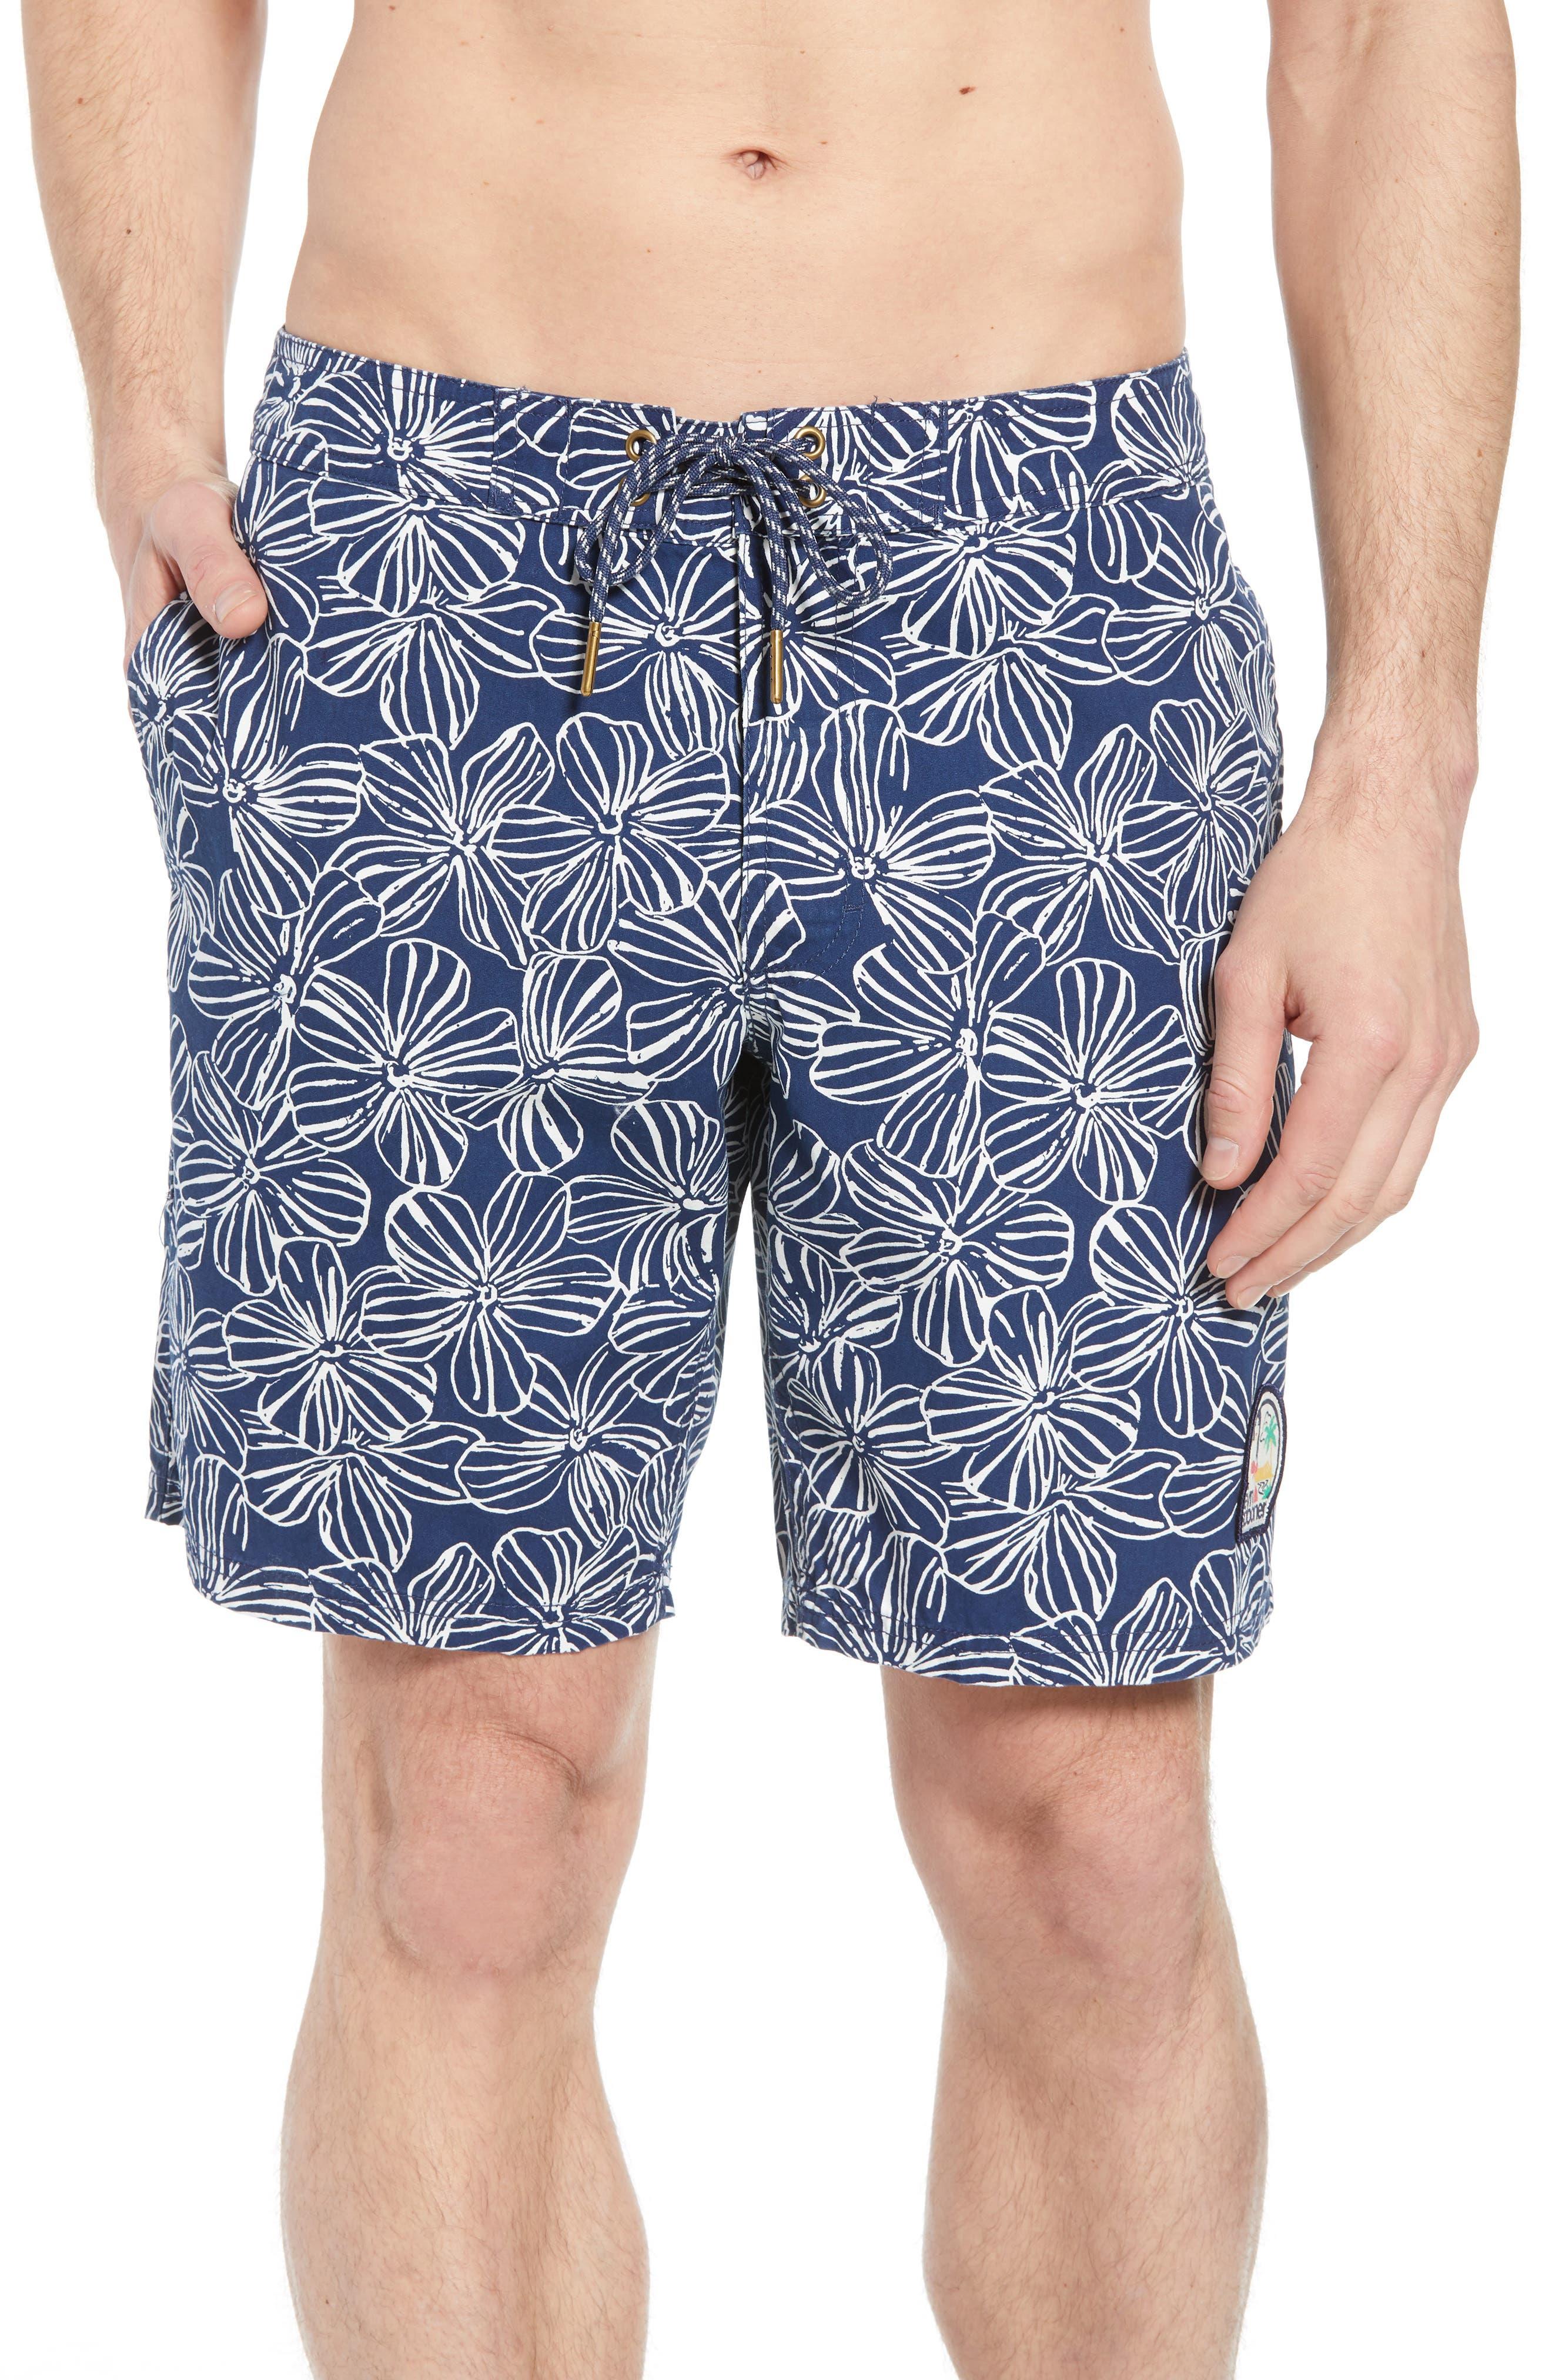 Mala Melia Regular Fit Board Shorts,                         Main,                         color, BLUE